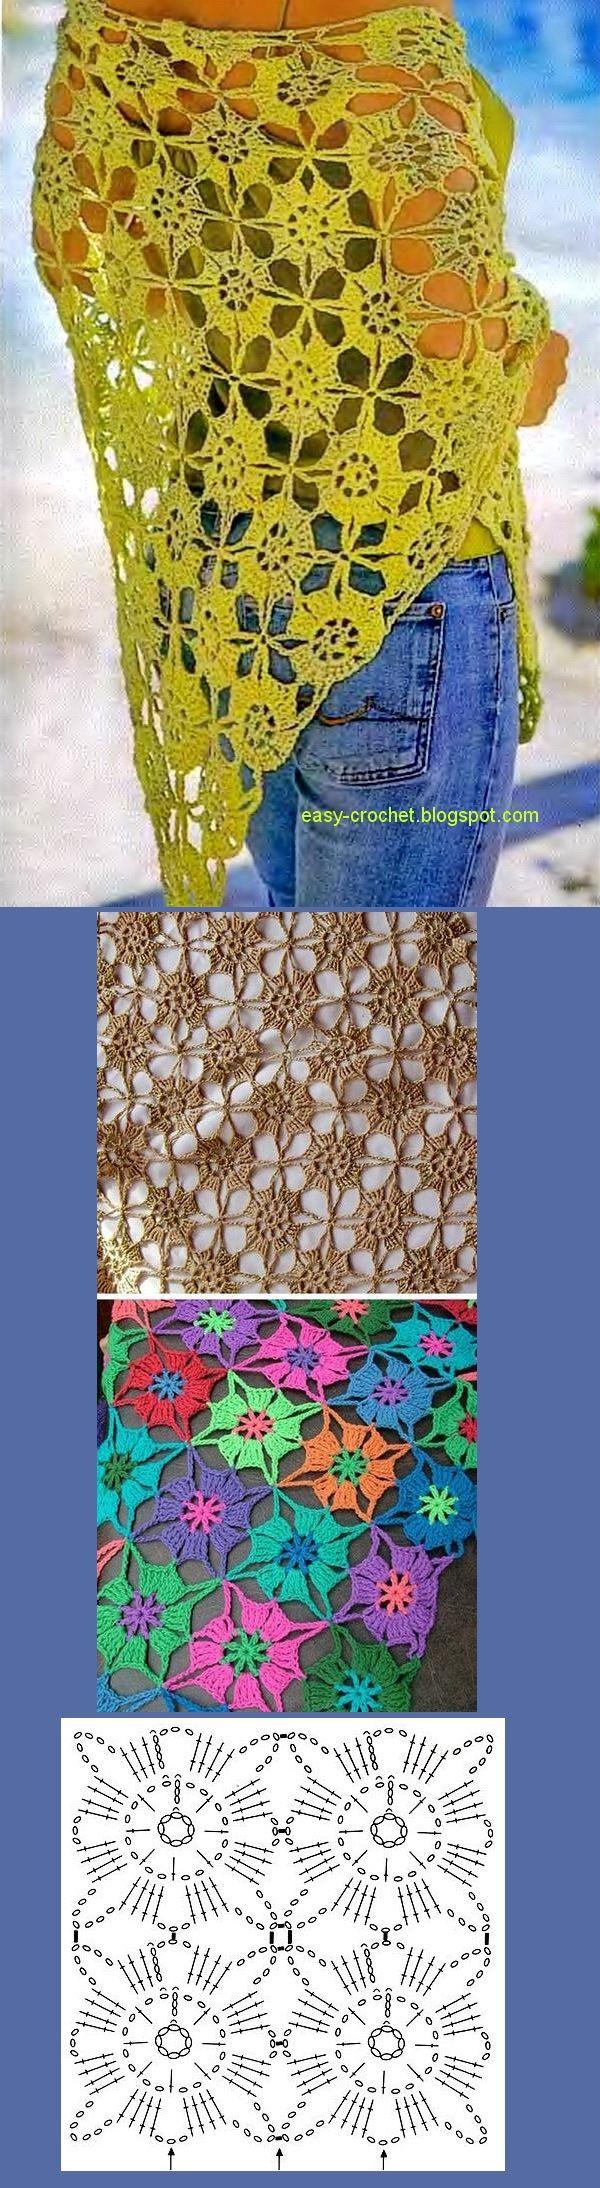 Stylish Crochet Fácil. Crochet Shawl with its diagram